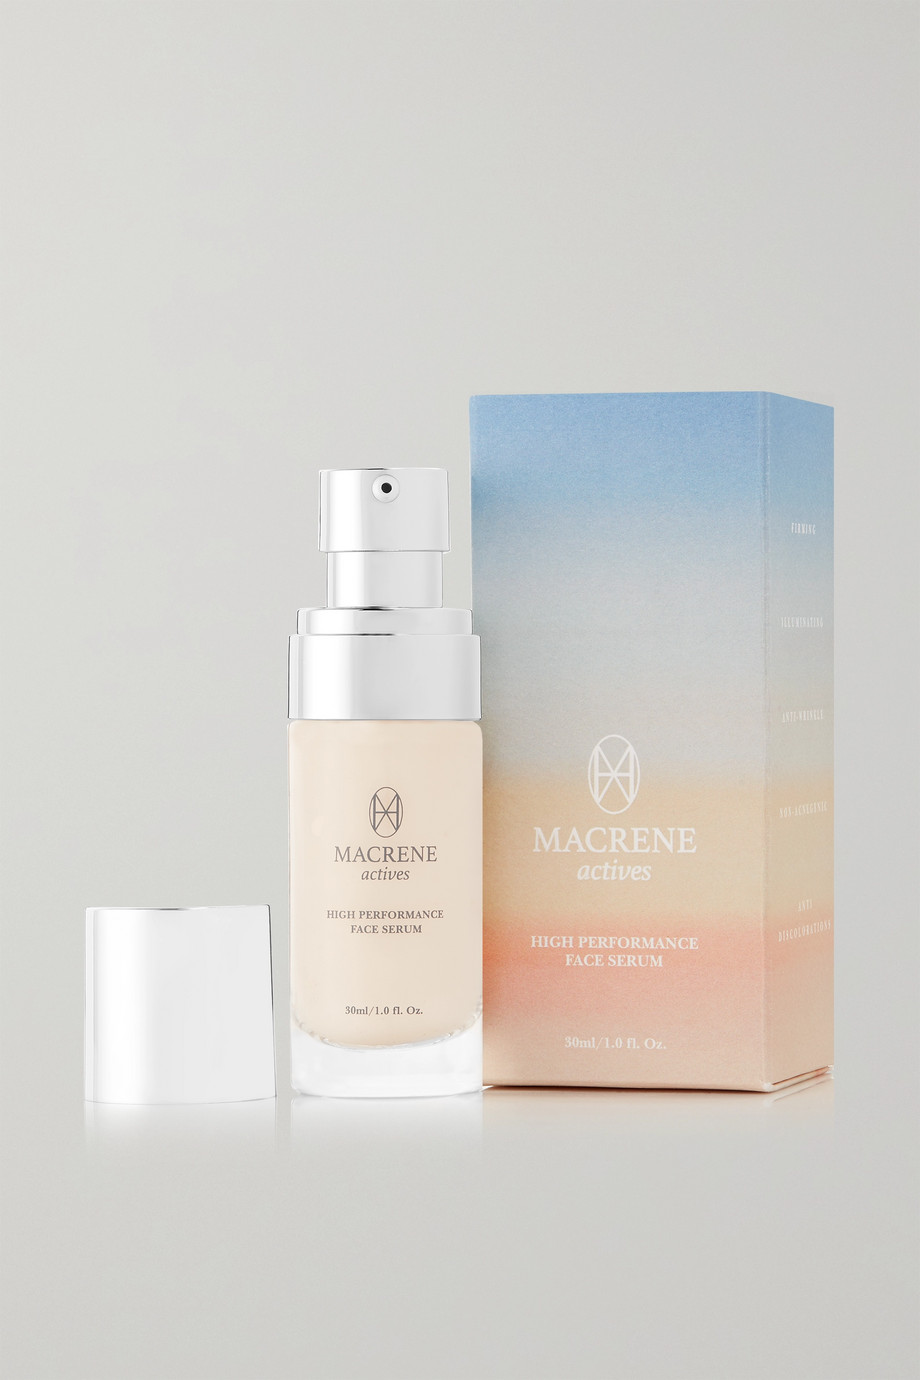 Macrene Actives High Performance Face Serum, 30ml